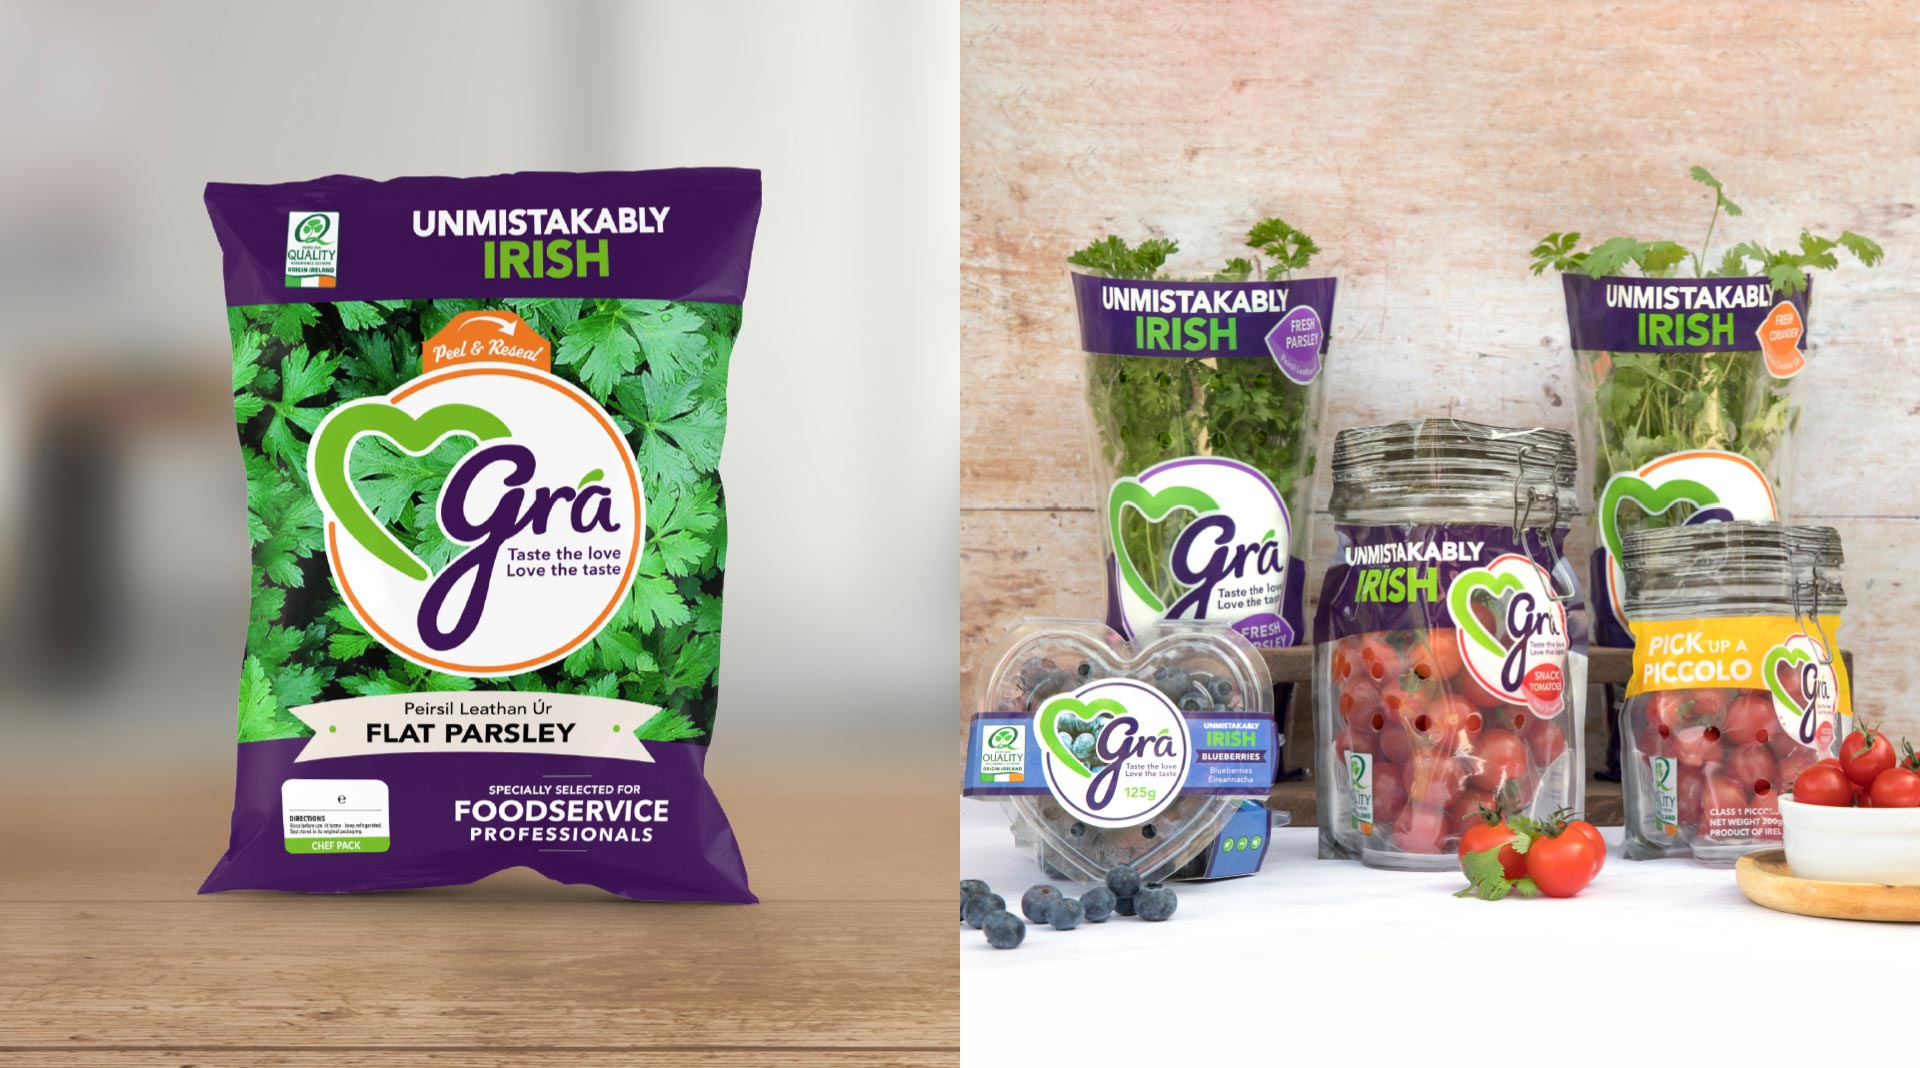 Grá food service packaging designed by Sweet.